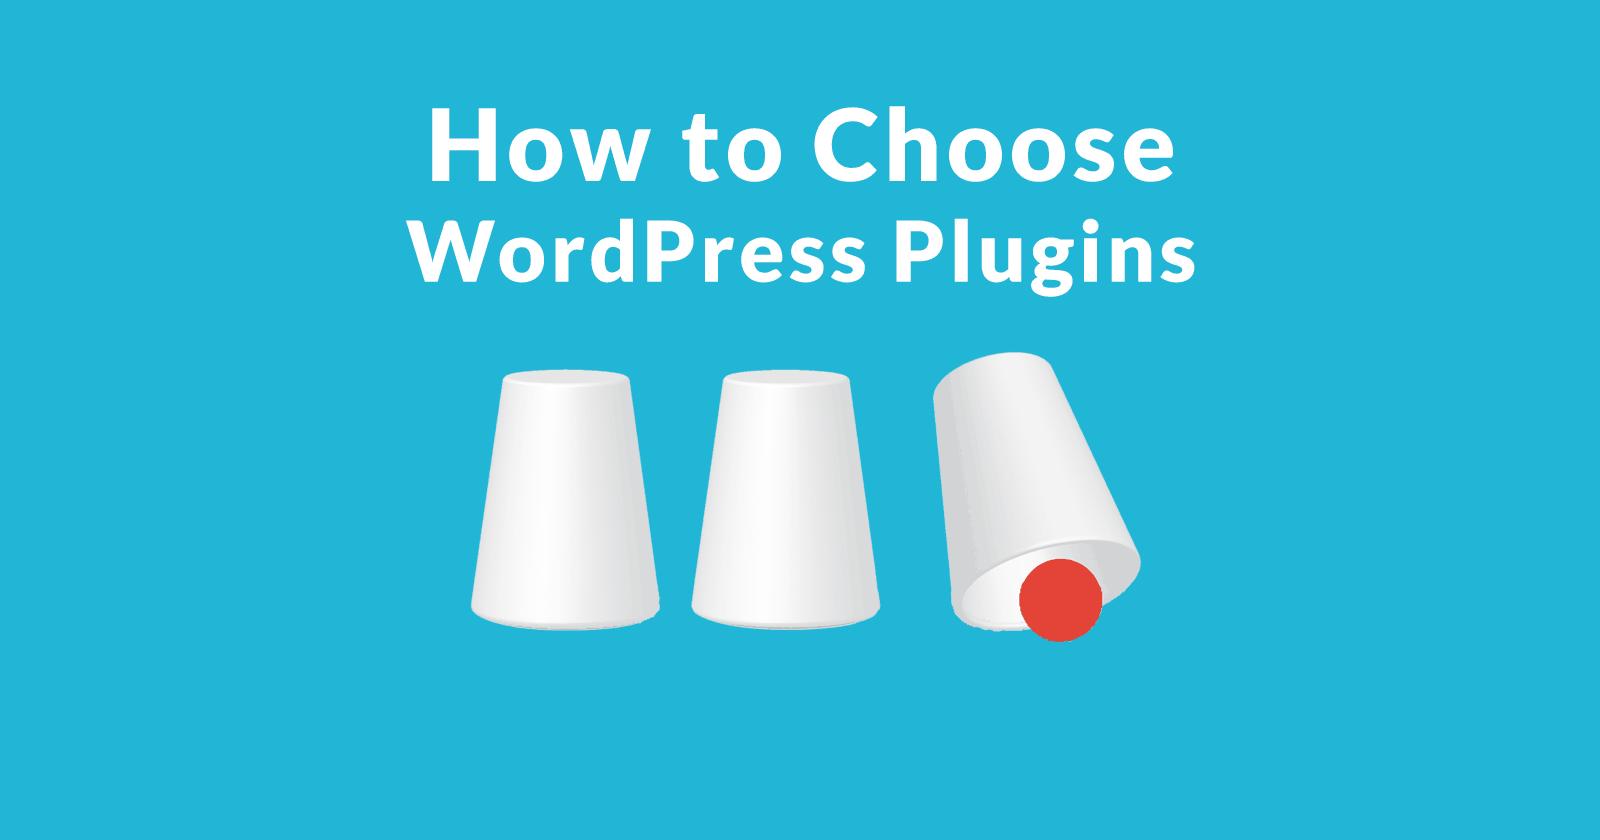 Comment choisir les plugins WordPress